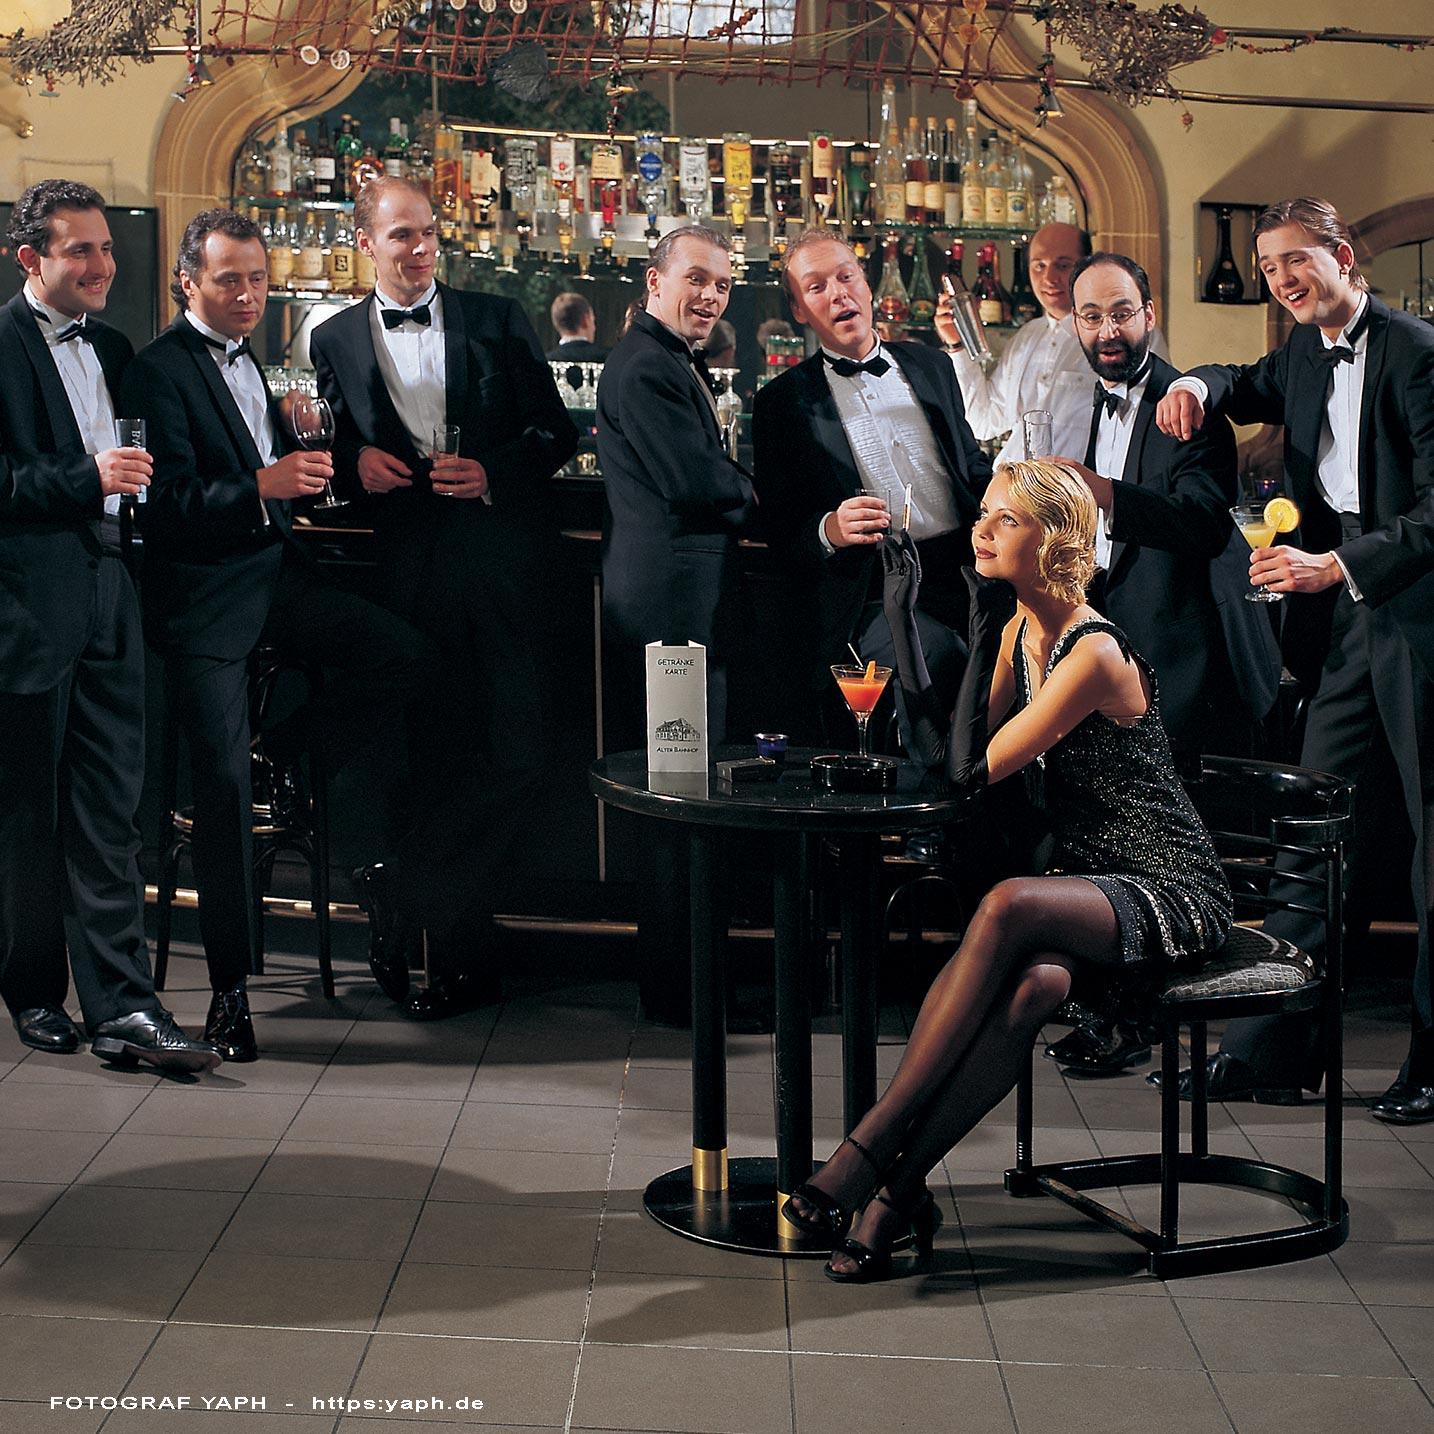 Werbefotografie, Businessfotografie in Trier - Yaph